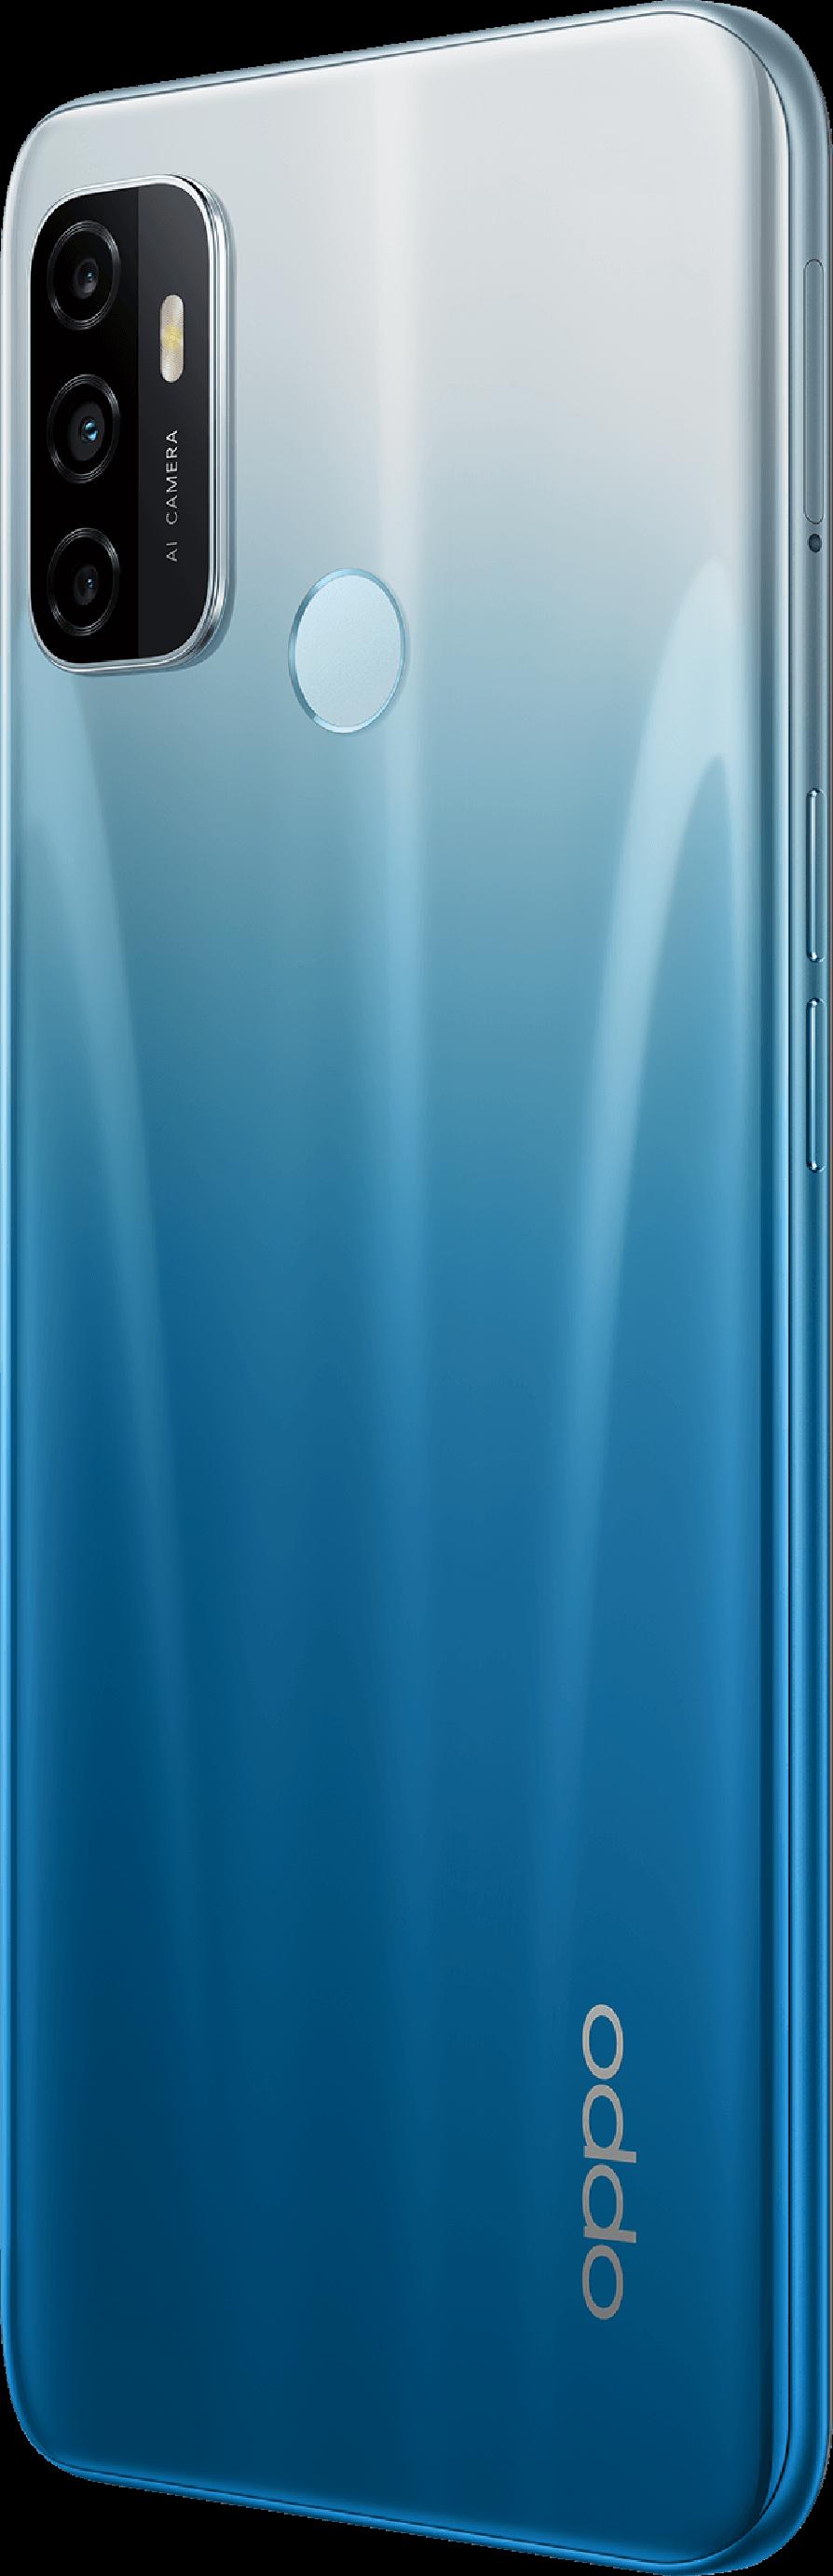 OPPO A53 Design